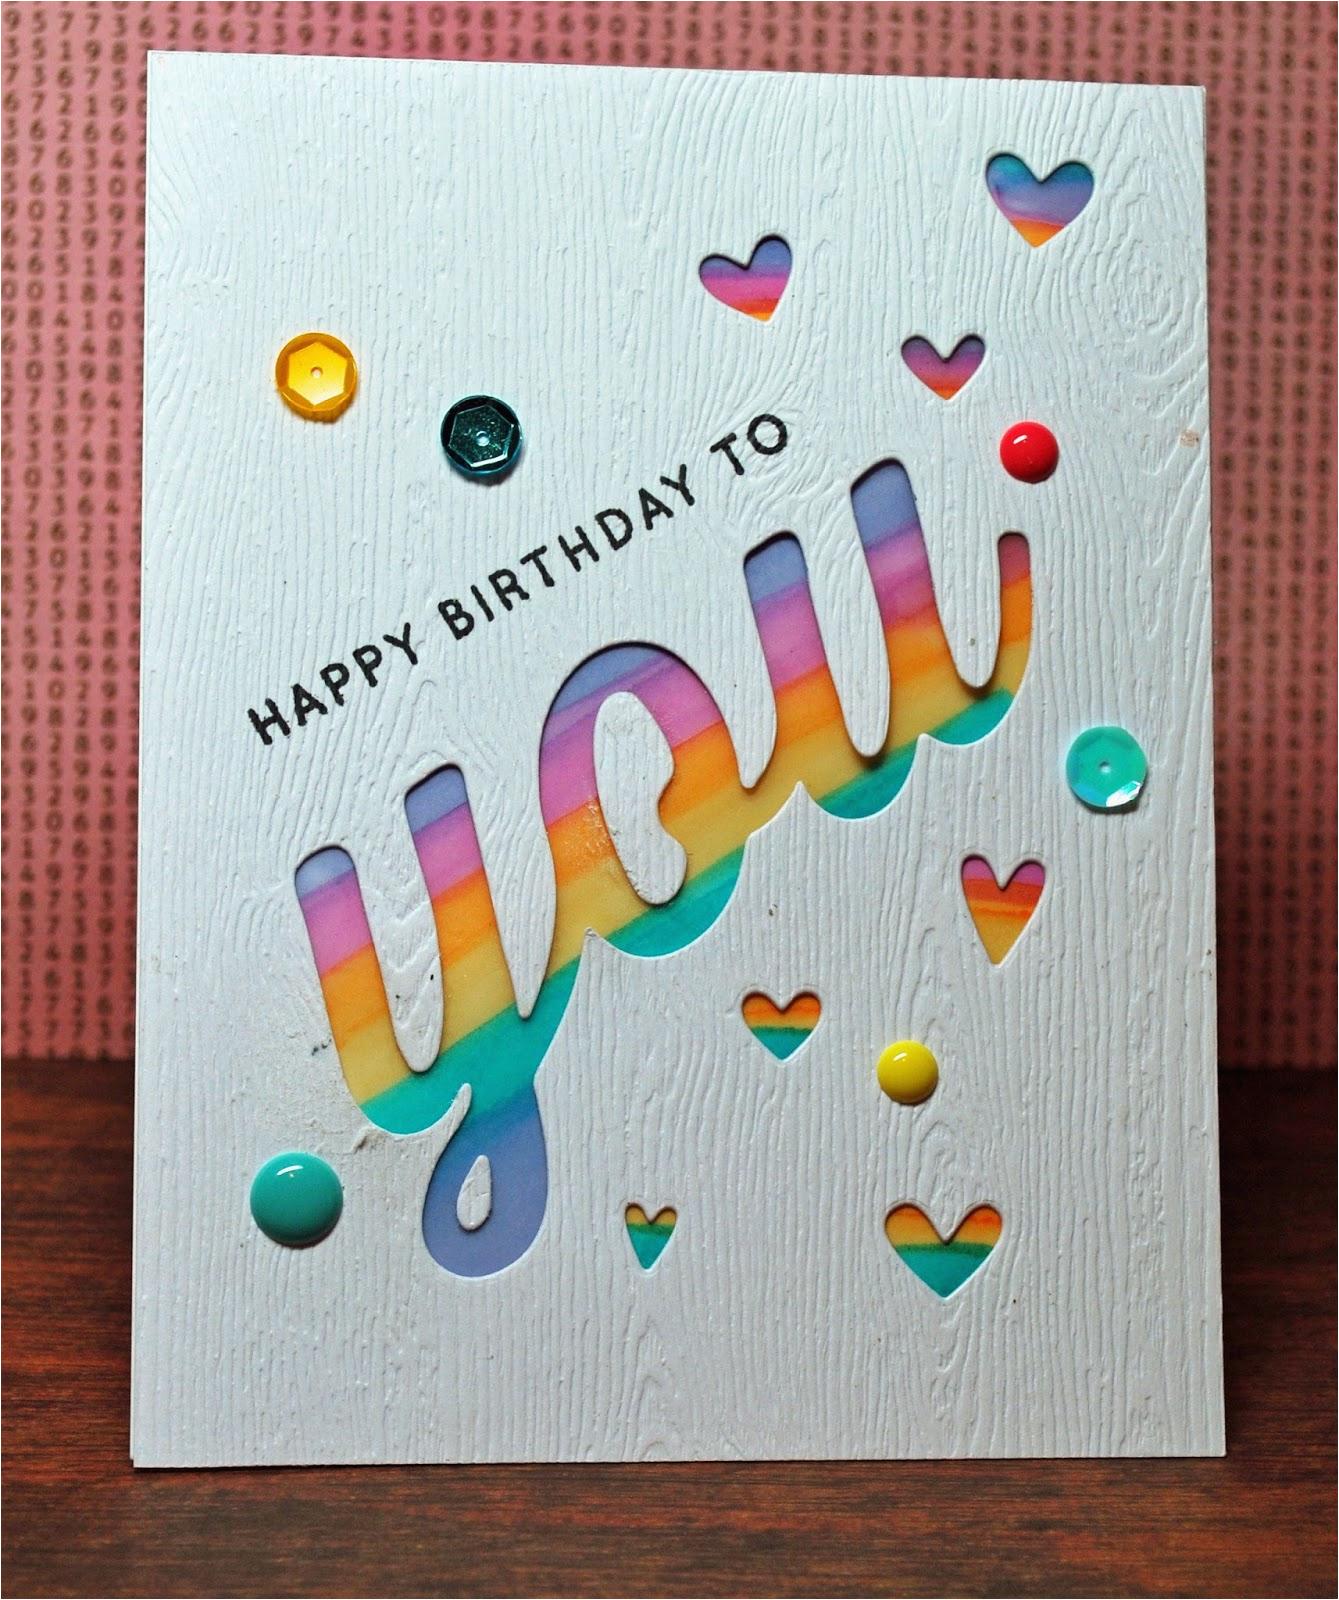 How to Make A Big Birthday Card Hd Birthday Wallpaper Free Printable Birthday Cards